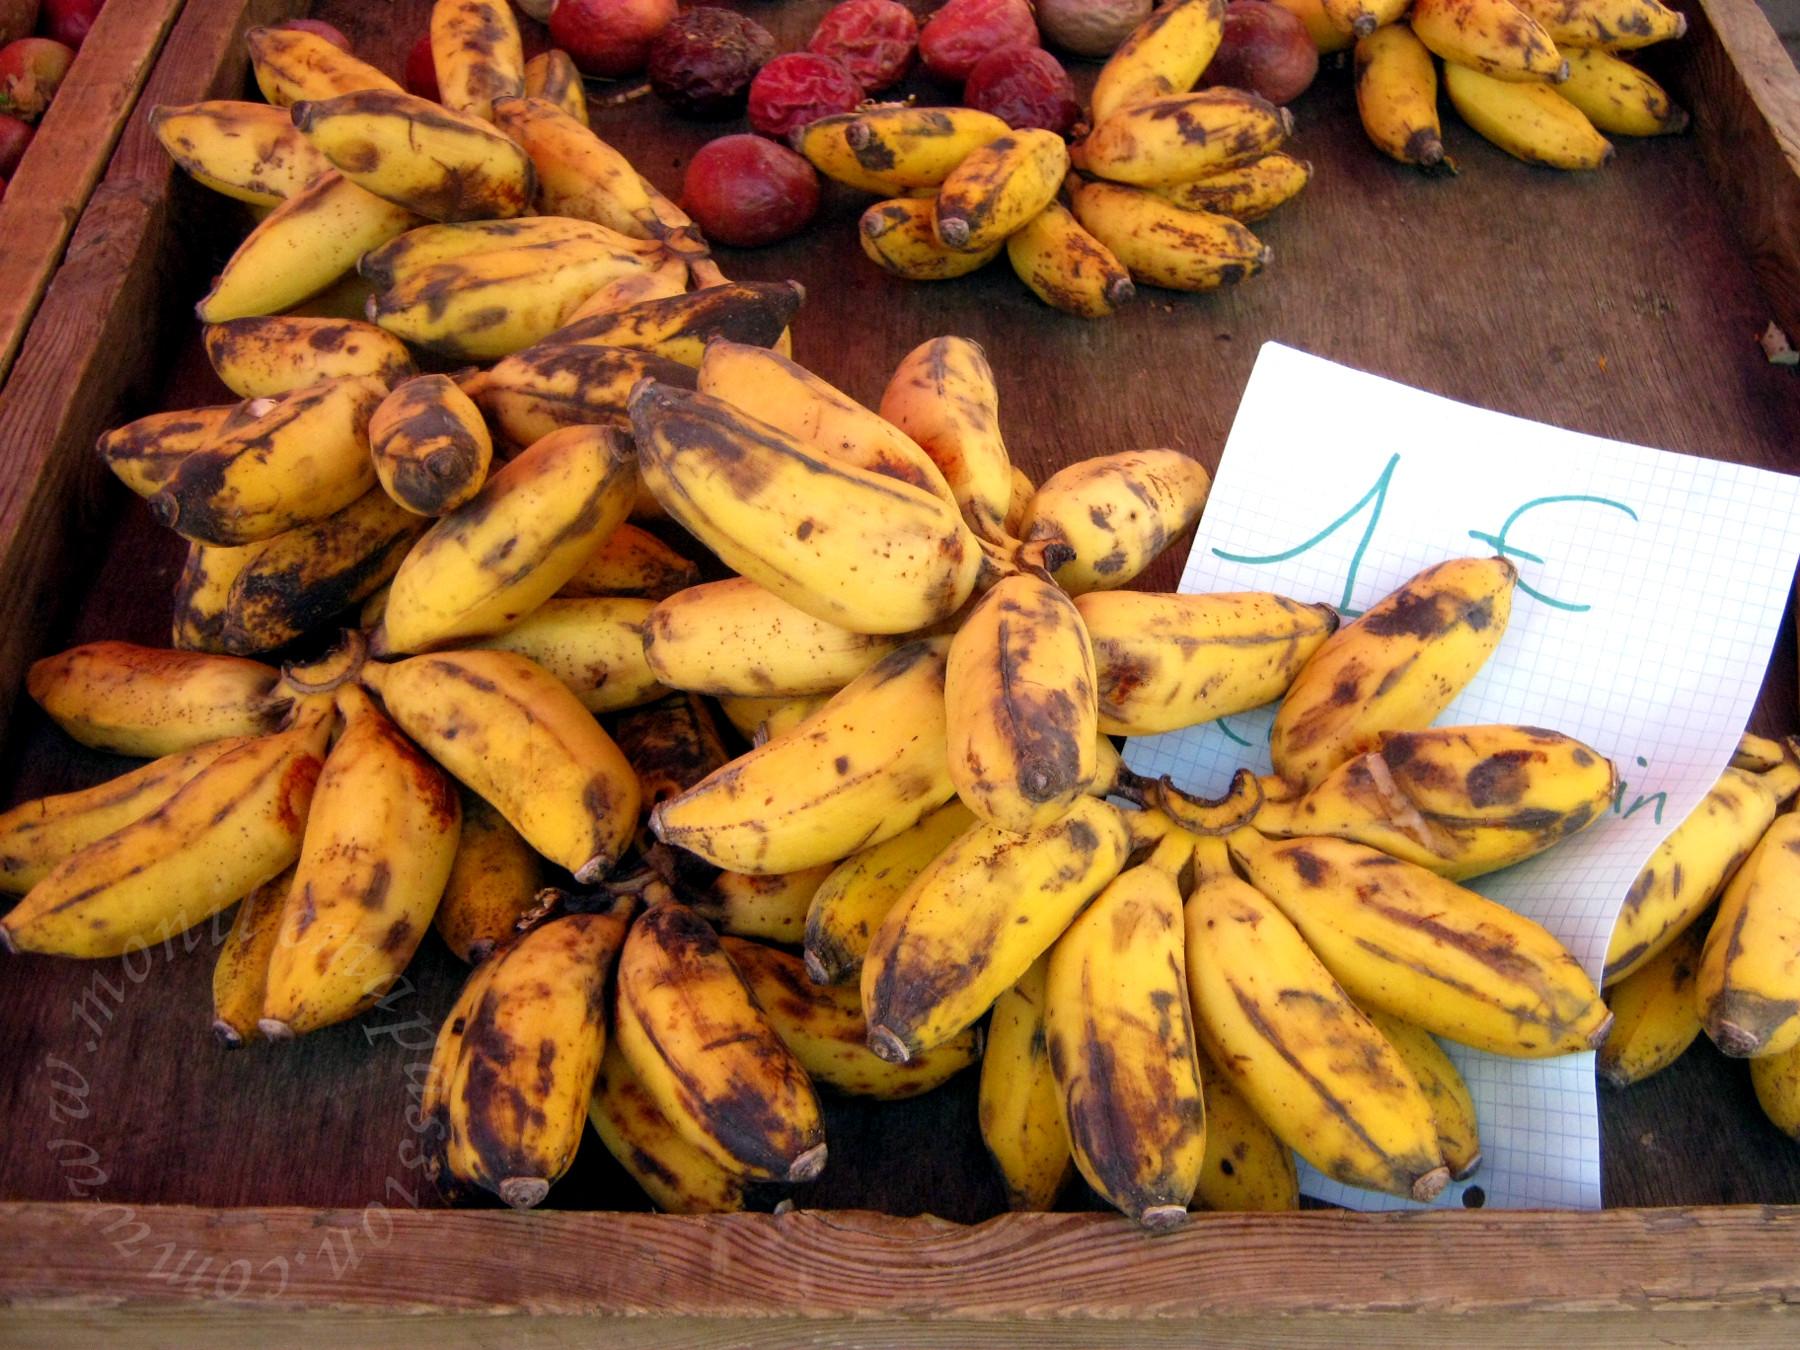 Petite bananes -- Baby bananas